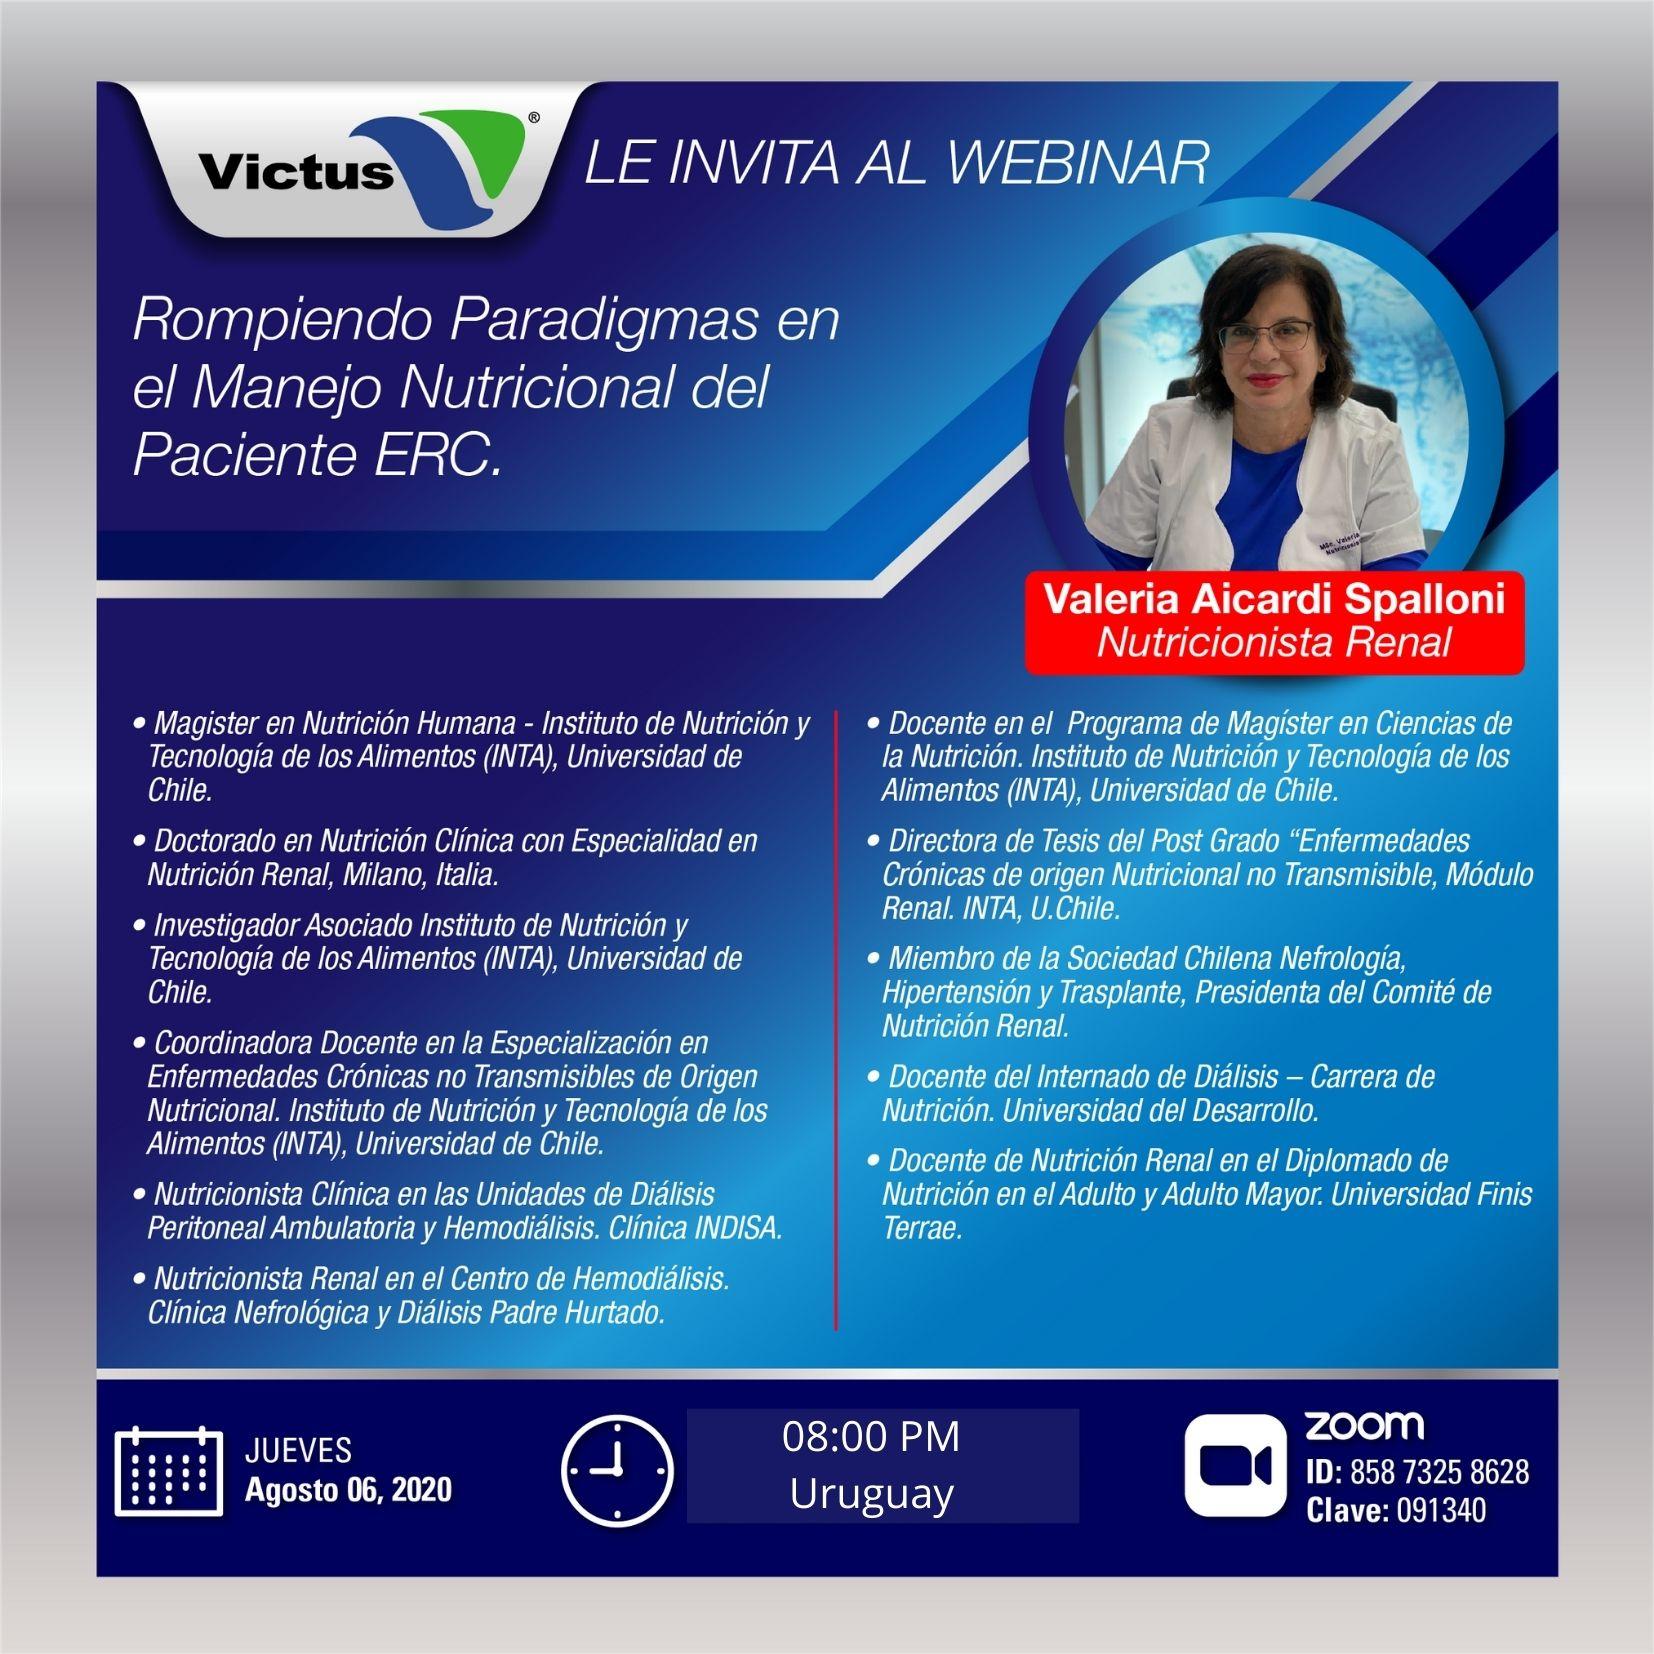 Webinar jueves 6 de agosto Dra. Valeria Aicardi